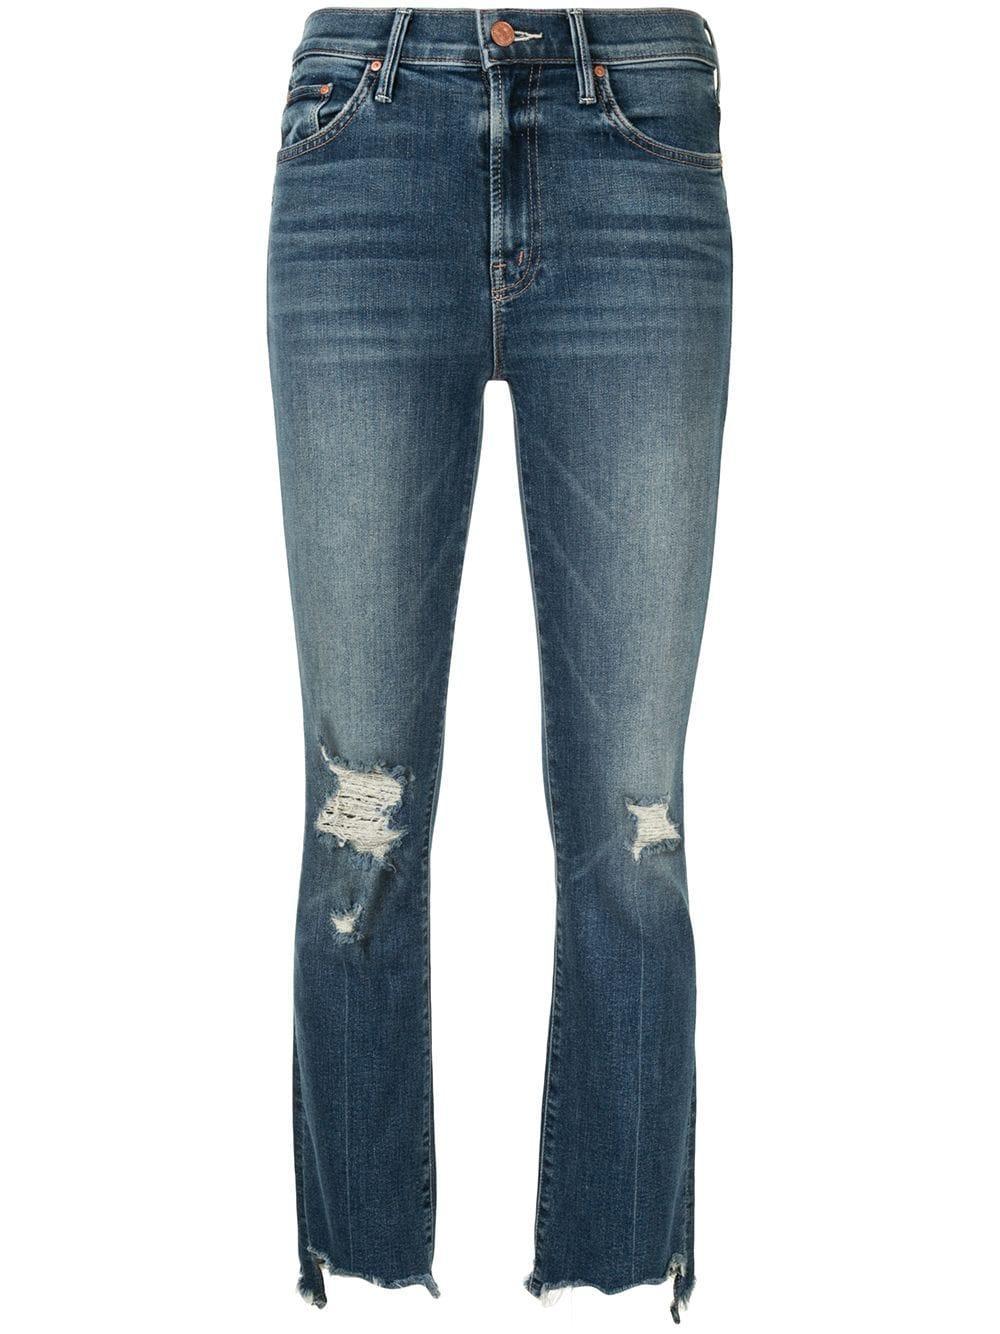 Insider Crop Step Chew Hem Jeans Item # 1417-104-DOC